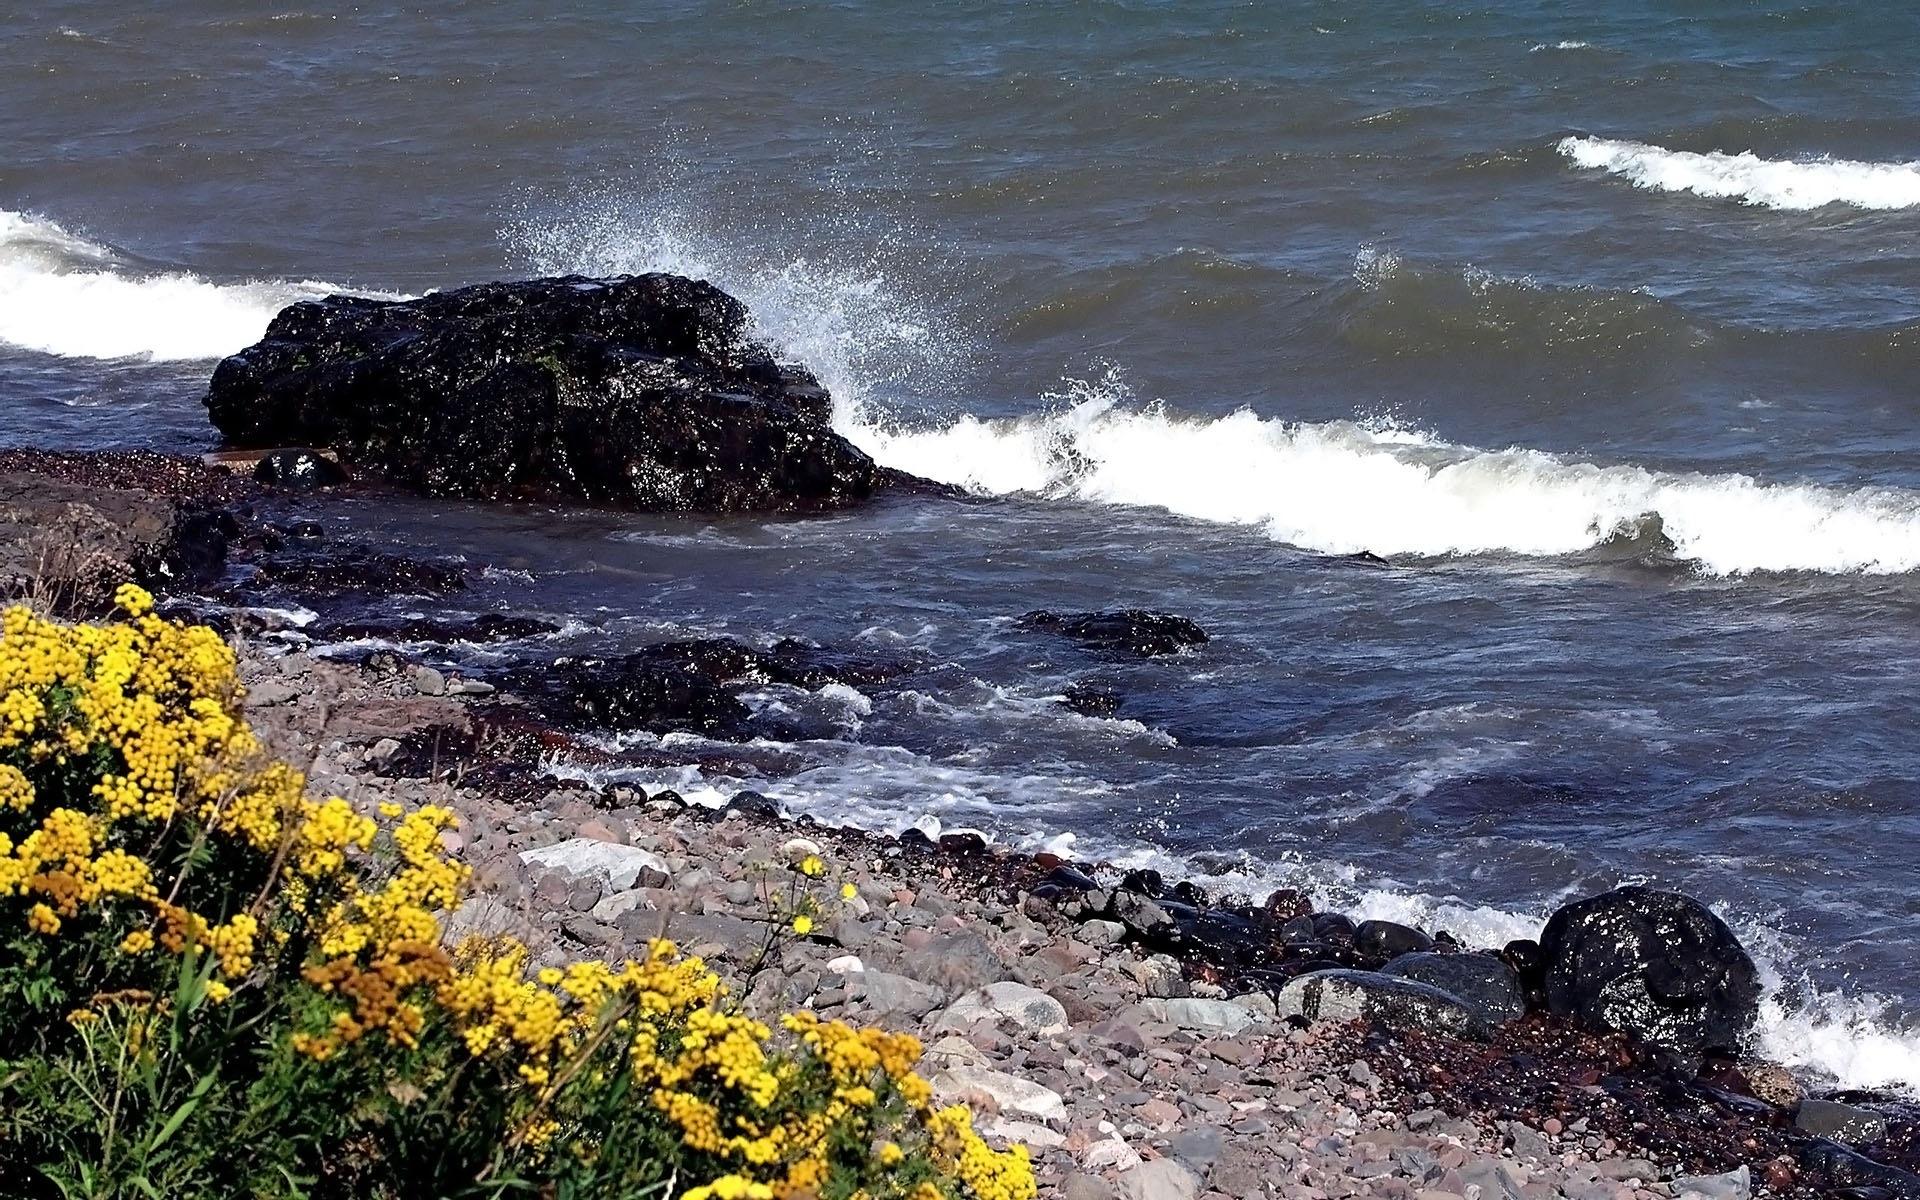 Картинки Камни, берег, брызги, волны, удар, цветы фото и обои на рабочий стол